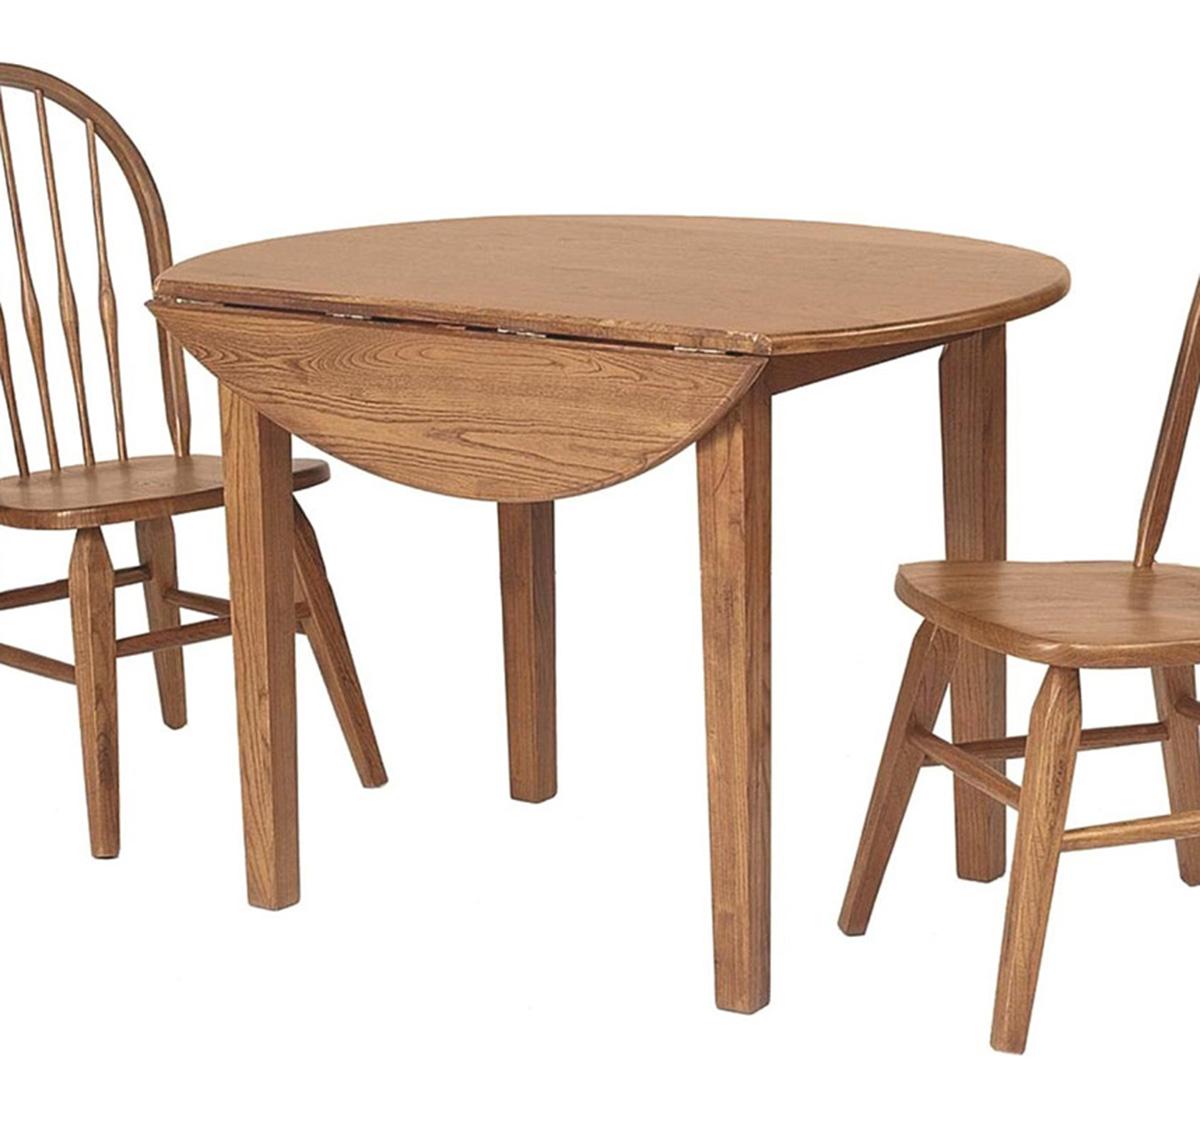 Chelsea Home Fruitwood Table - Hervest Oak